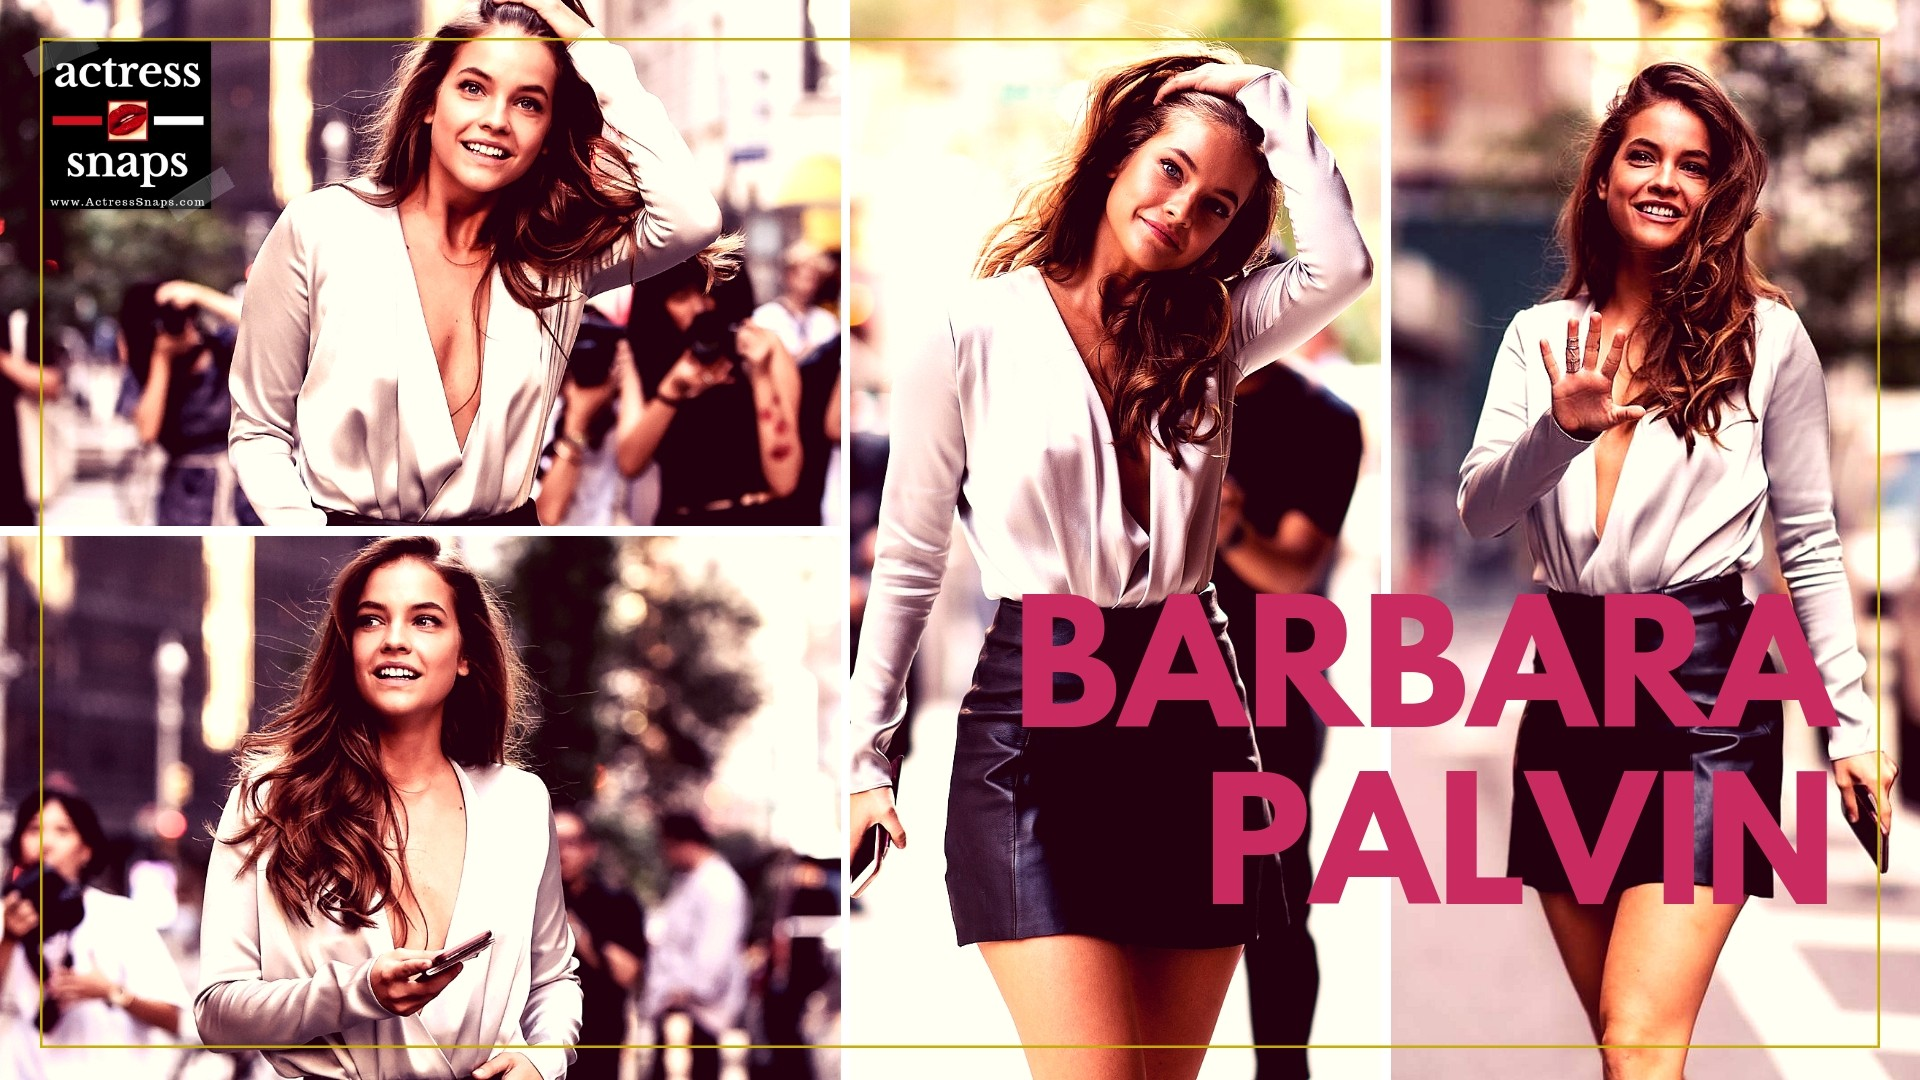 Sexy Barbara Palvin in Sexy Leather Mini Skirt - Sexy Actress Pictures   Hot Actress Pictures - ActressSnaps.com